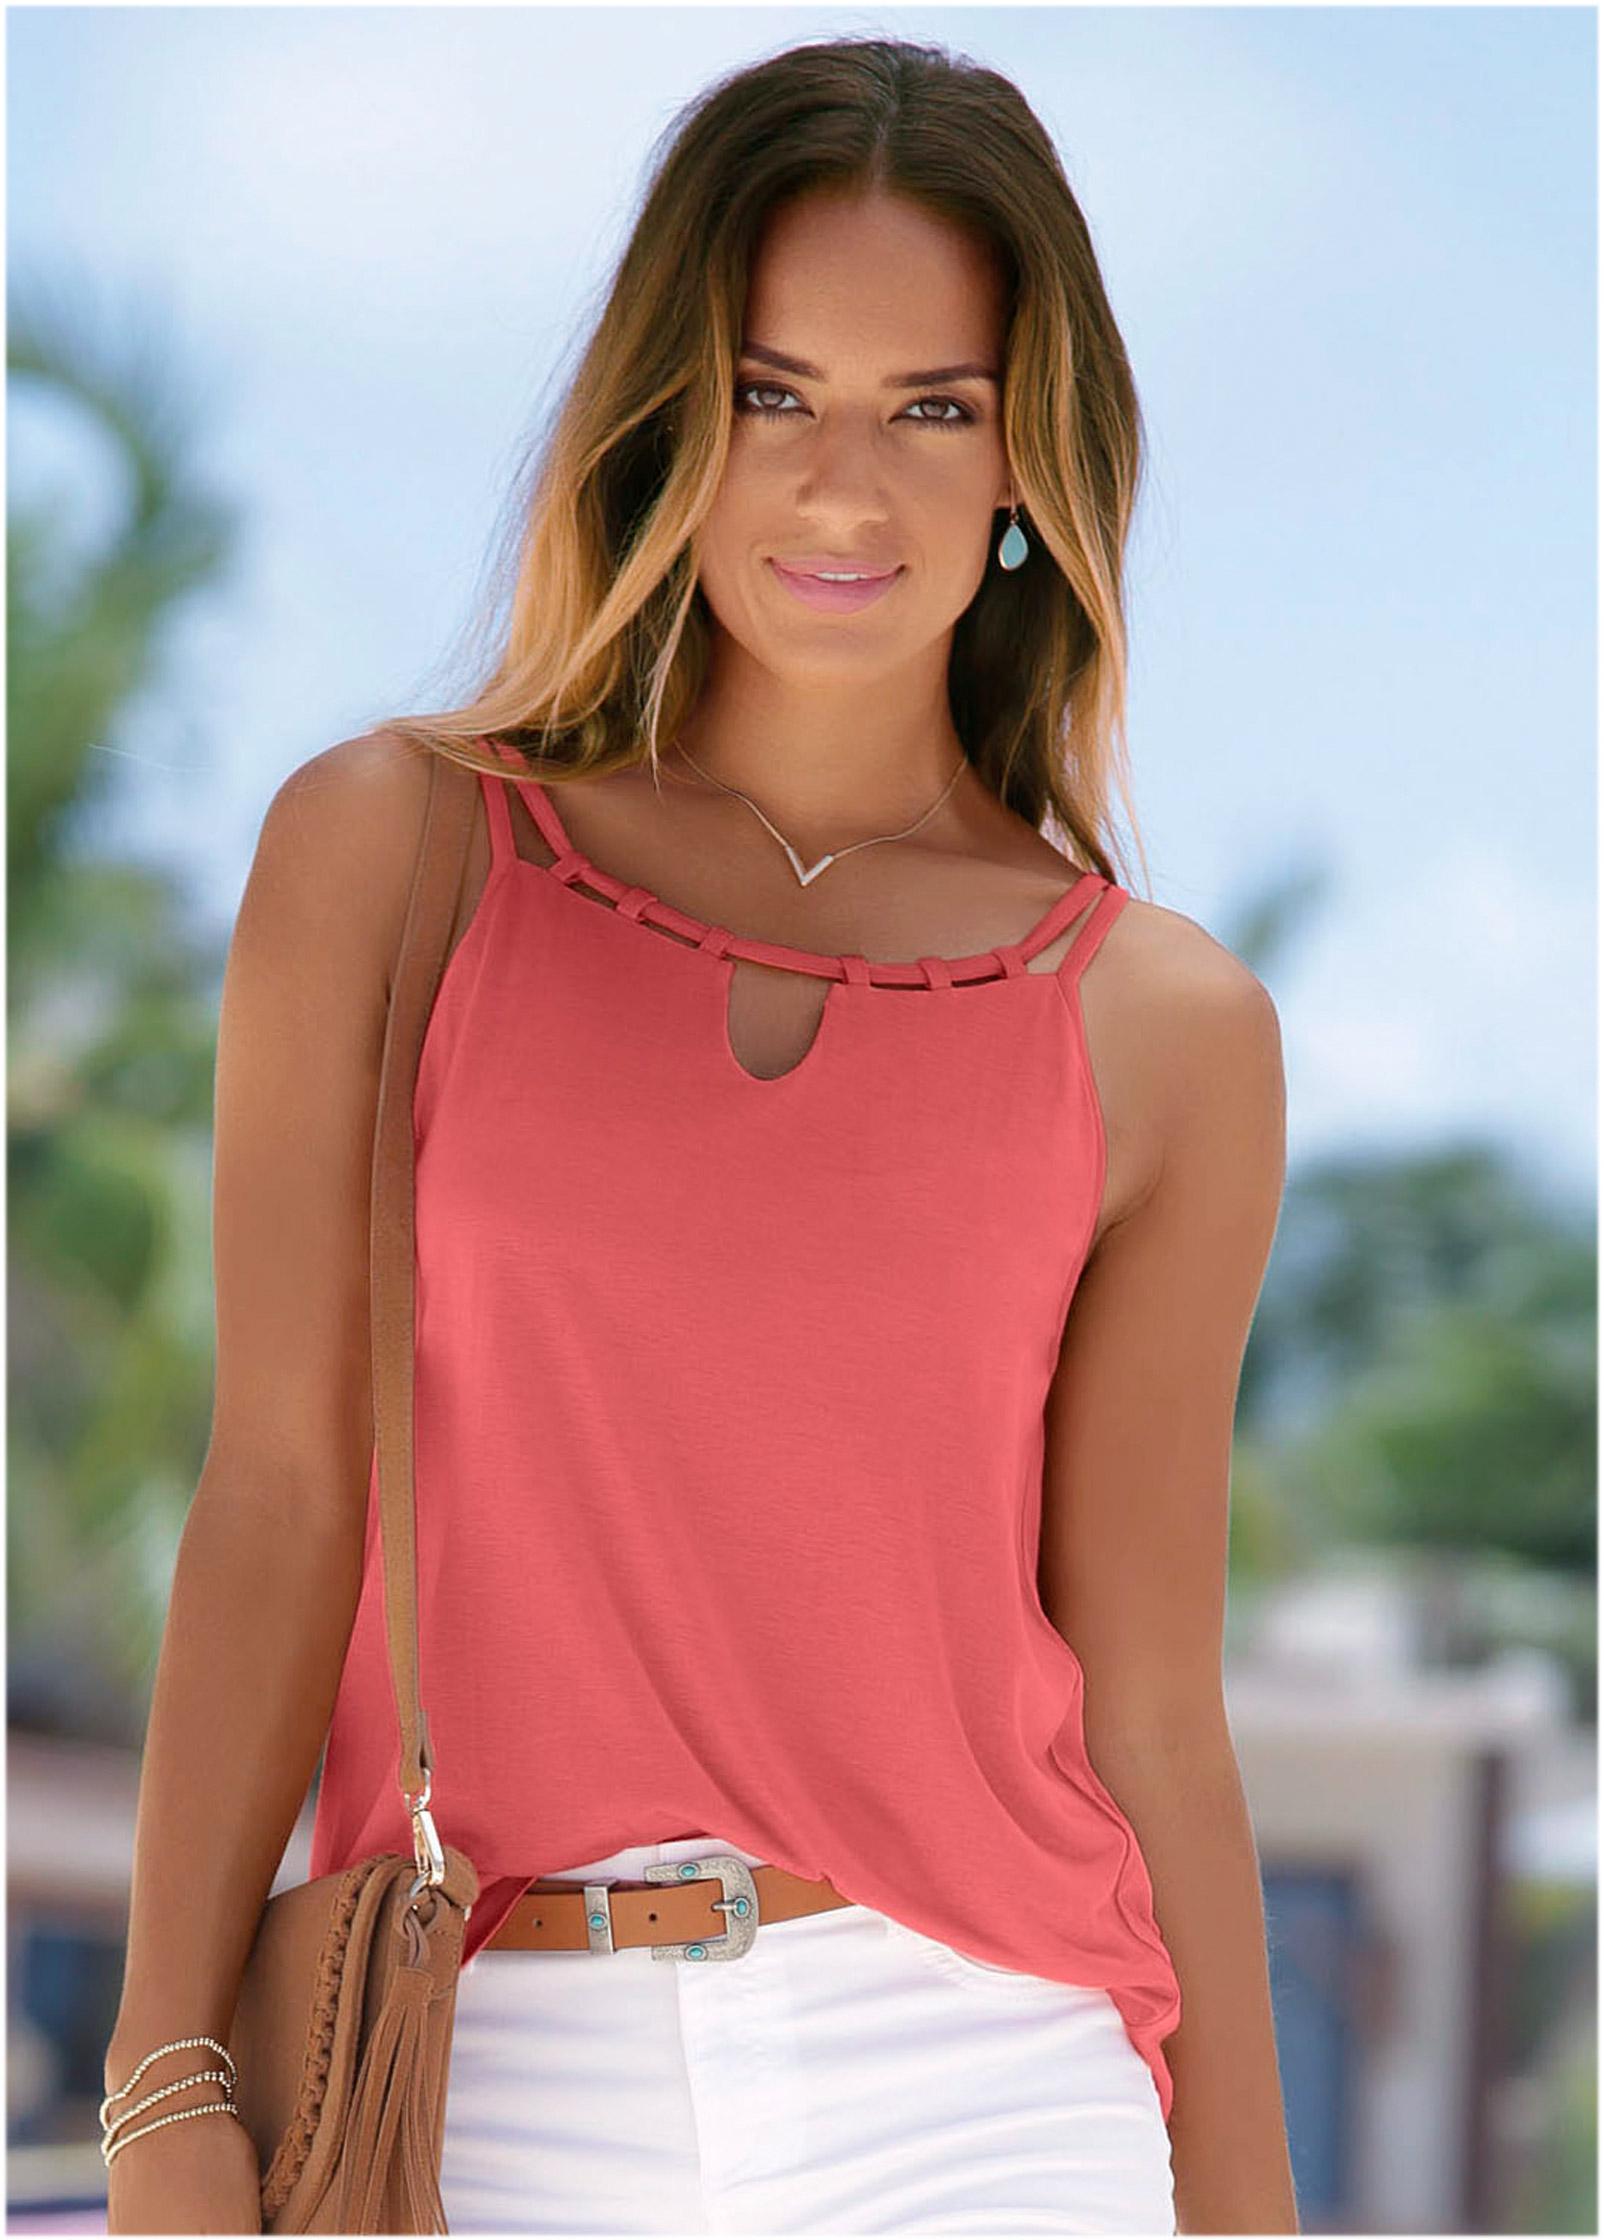 Women's Clothing 2 Color Fashion Women Casual Loose Tops Blouses Lattice Shirt Top Vintage Plaid Long Sleeve Shirts Blusas Mujer De Moda Low Price